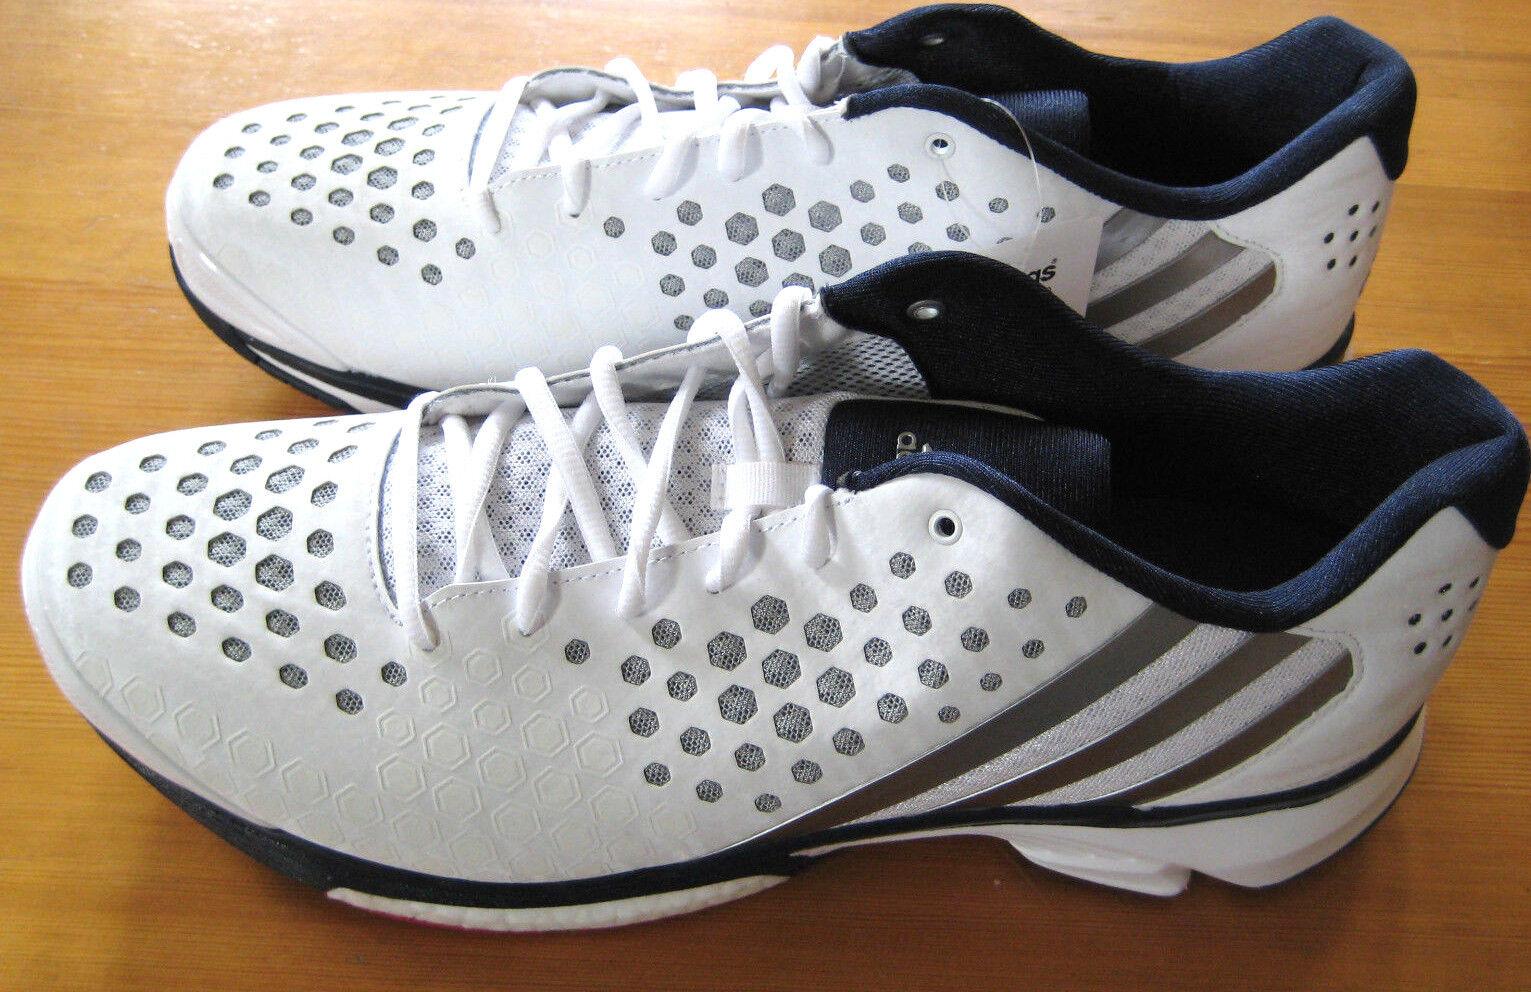 best service b0c58 f8b06 Adidas Volley Response Boost B34148 Volleyball Freizeit Freizeit Freizeit  Lauf Schuhe schw-weiss. 989b89